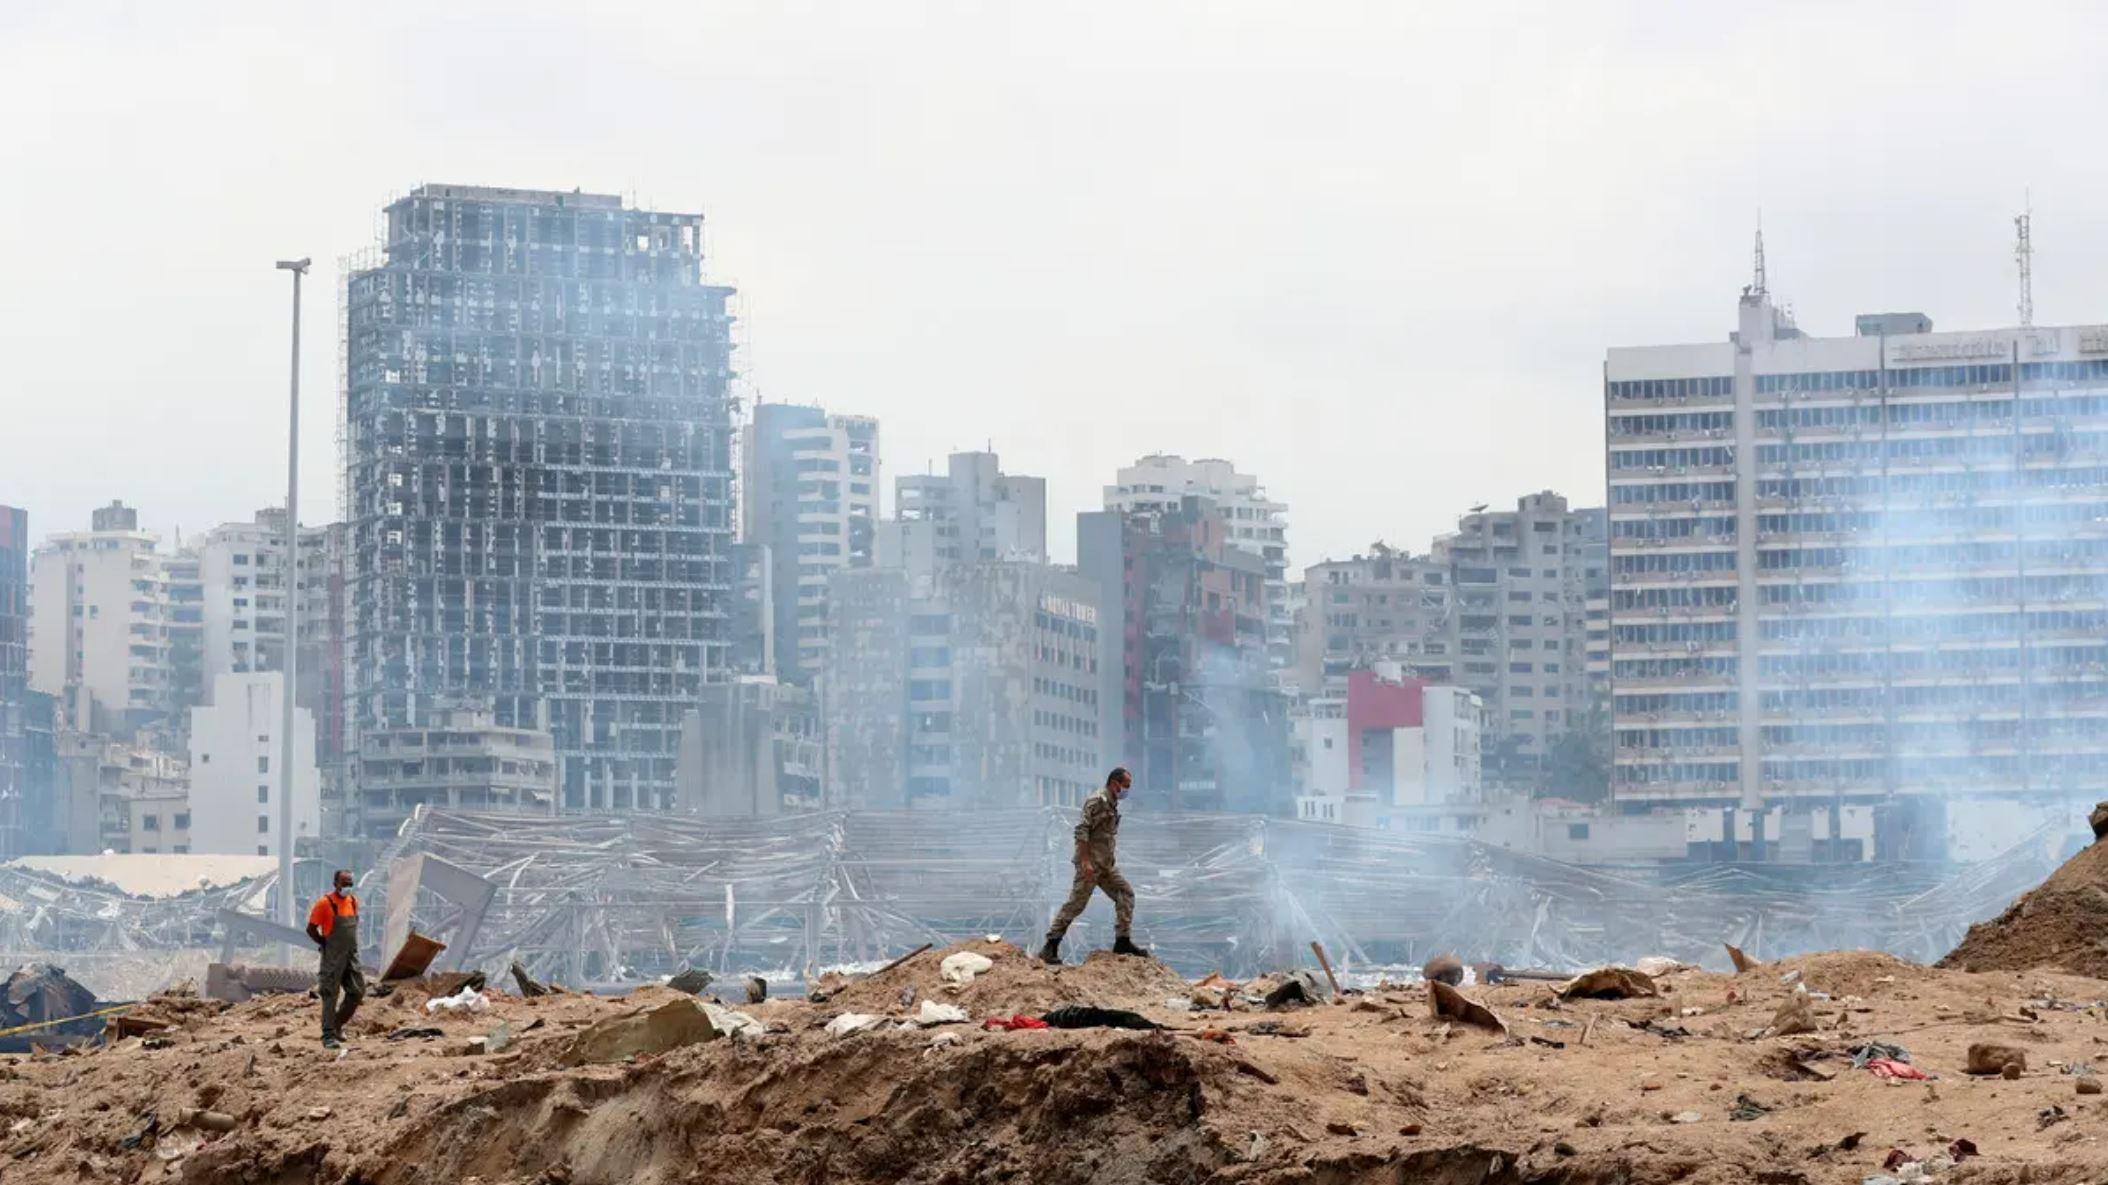 Beirut blast: Lebanon's crisis hotline witnesses surge in calls as anniversary nears